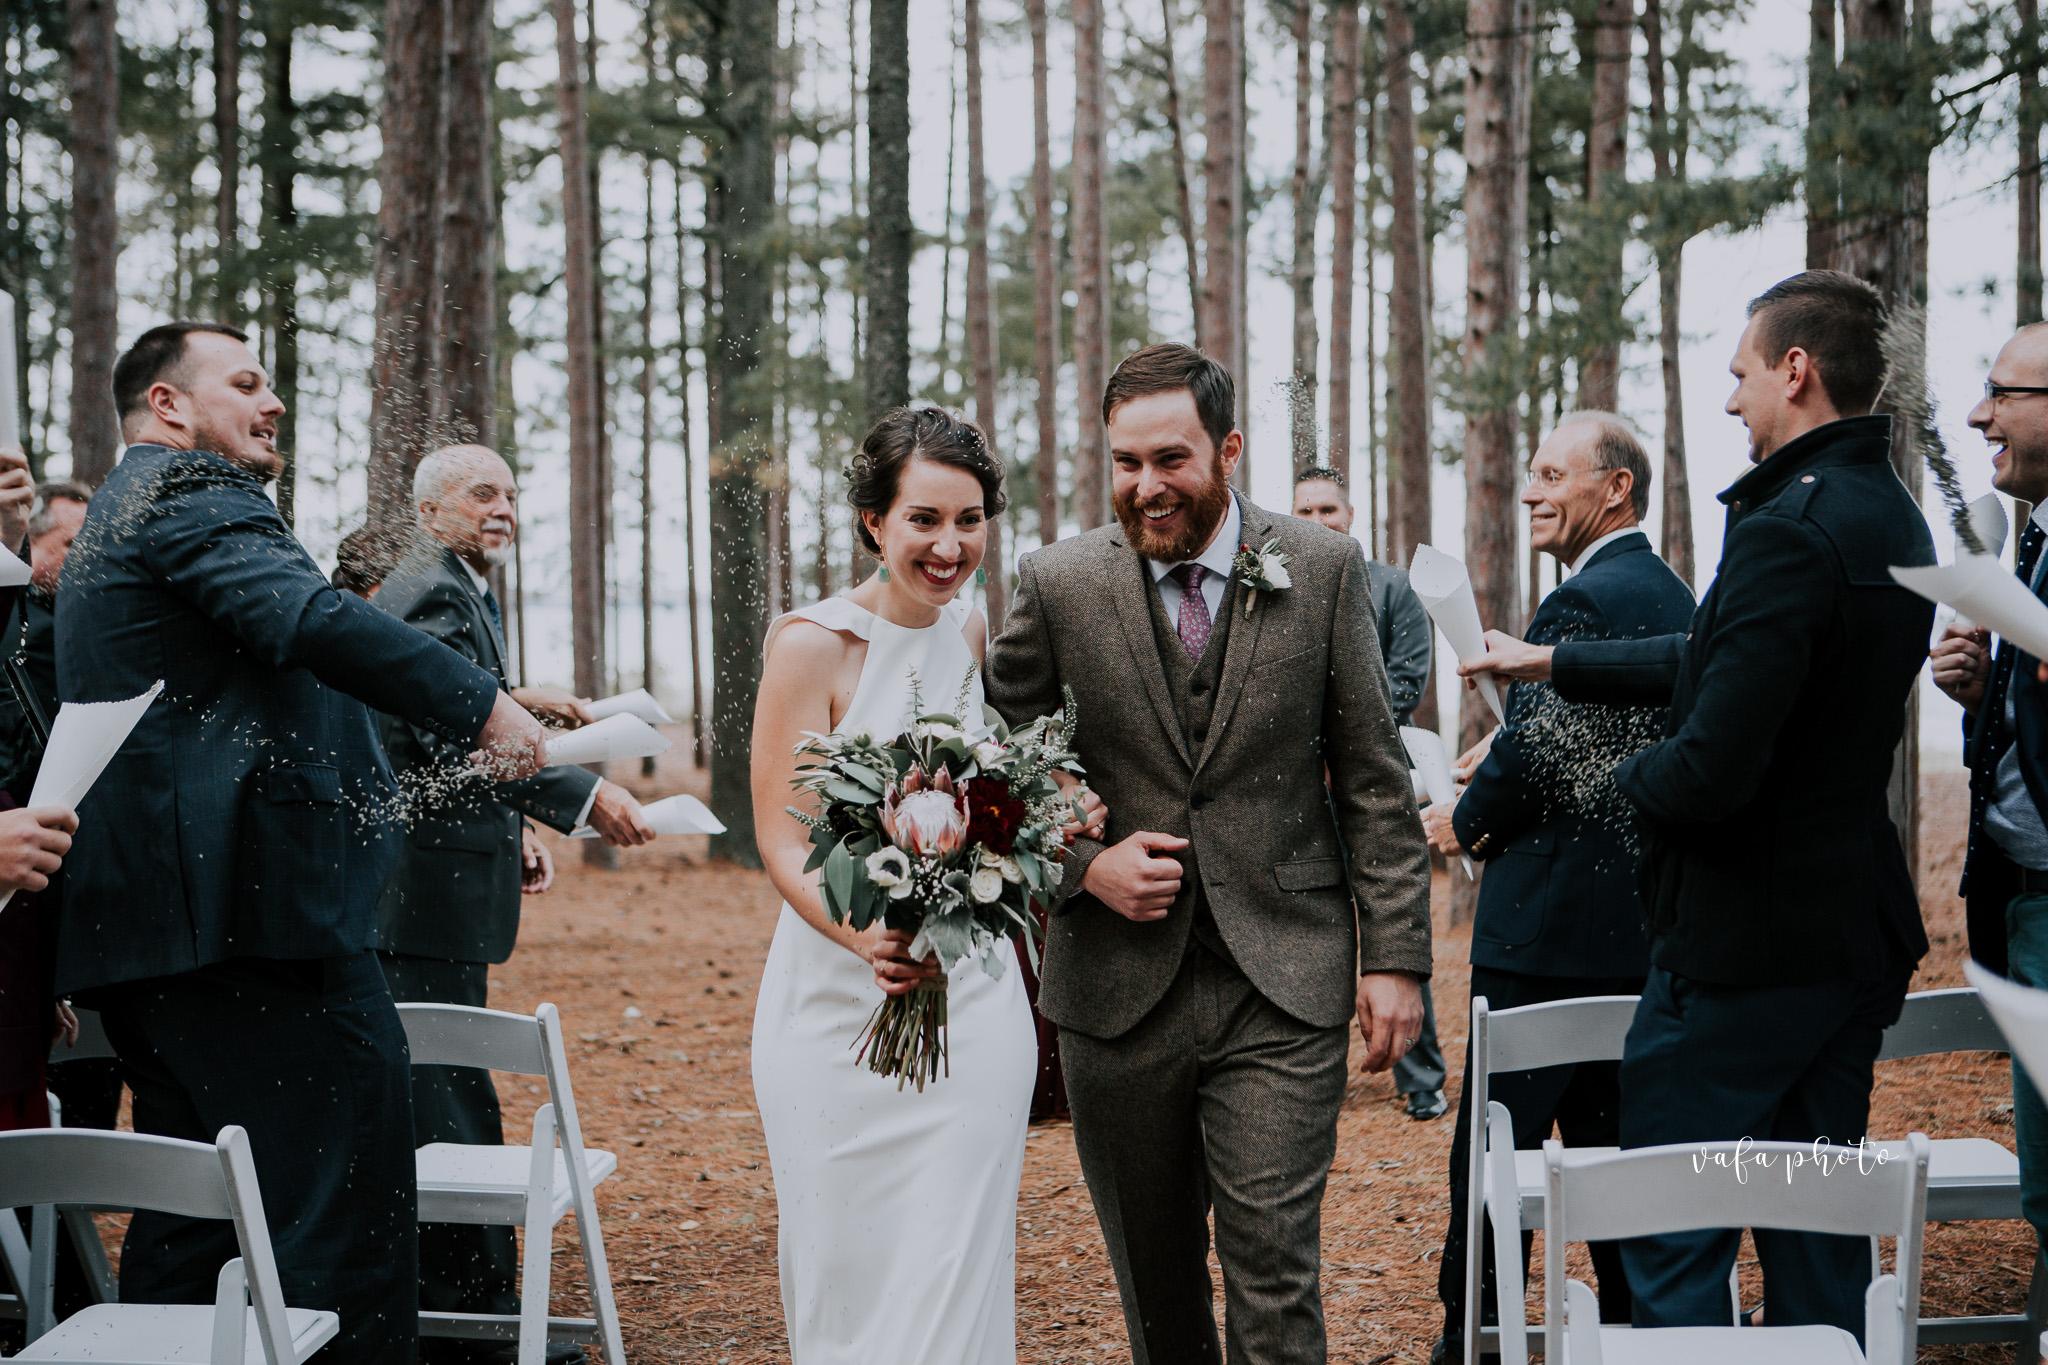 Little-Presque-Isle-Michigan-Wedding-Kim-Kyle-Vafa-Photo-272.jpg